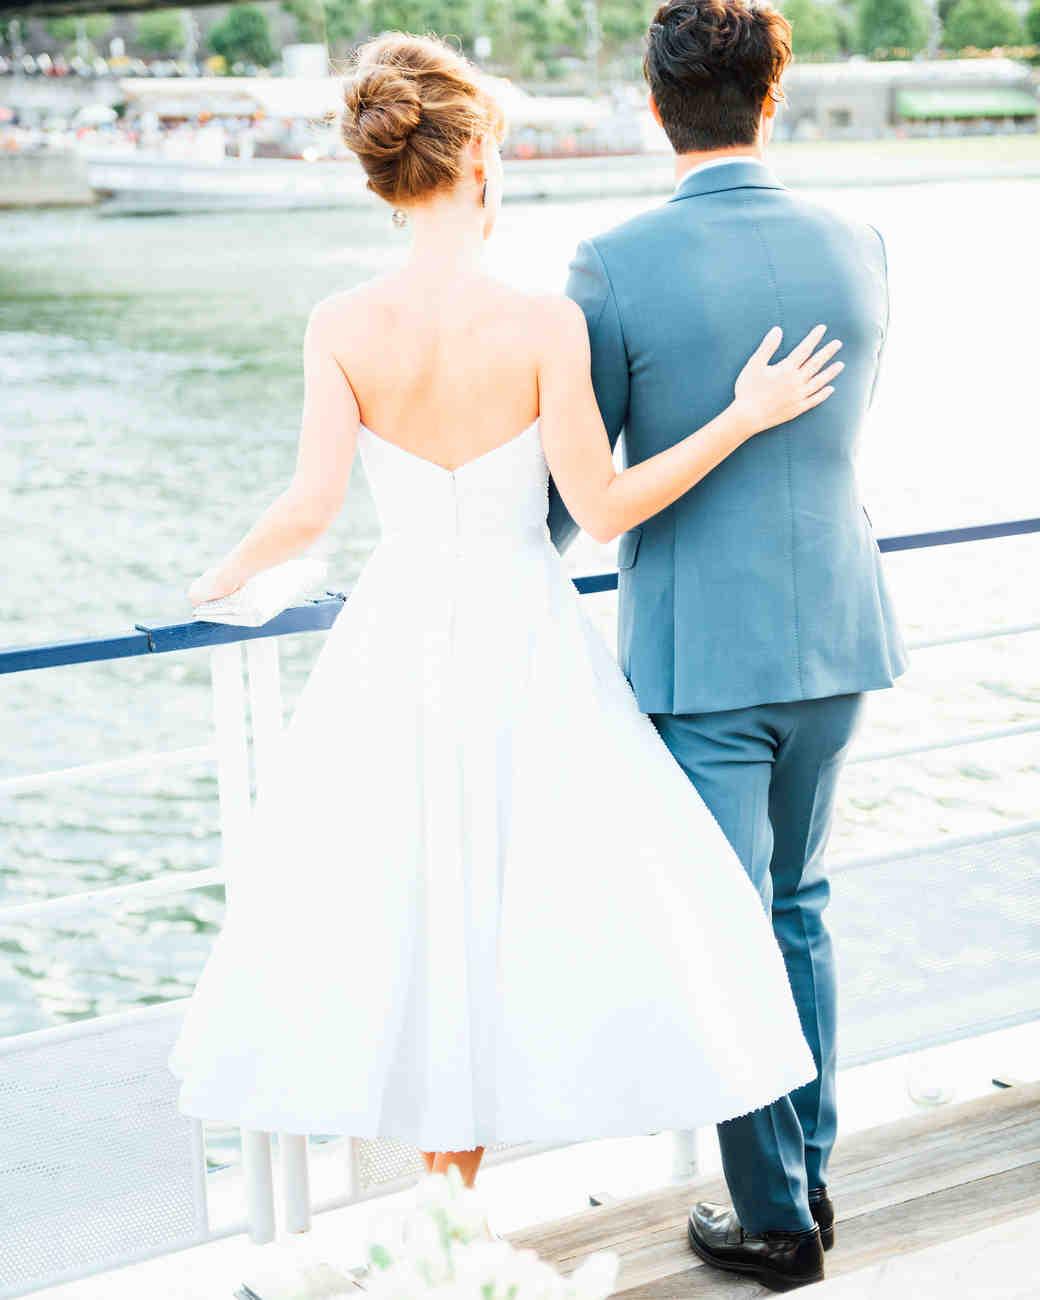 jenny-freddie-boatride-couple-069-s112779-1215.jpg